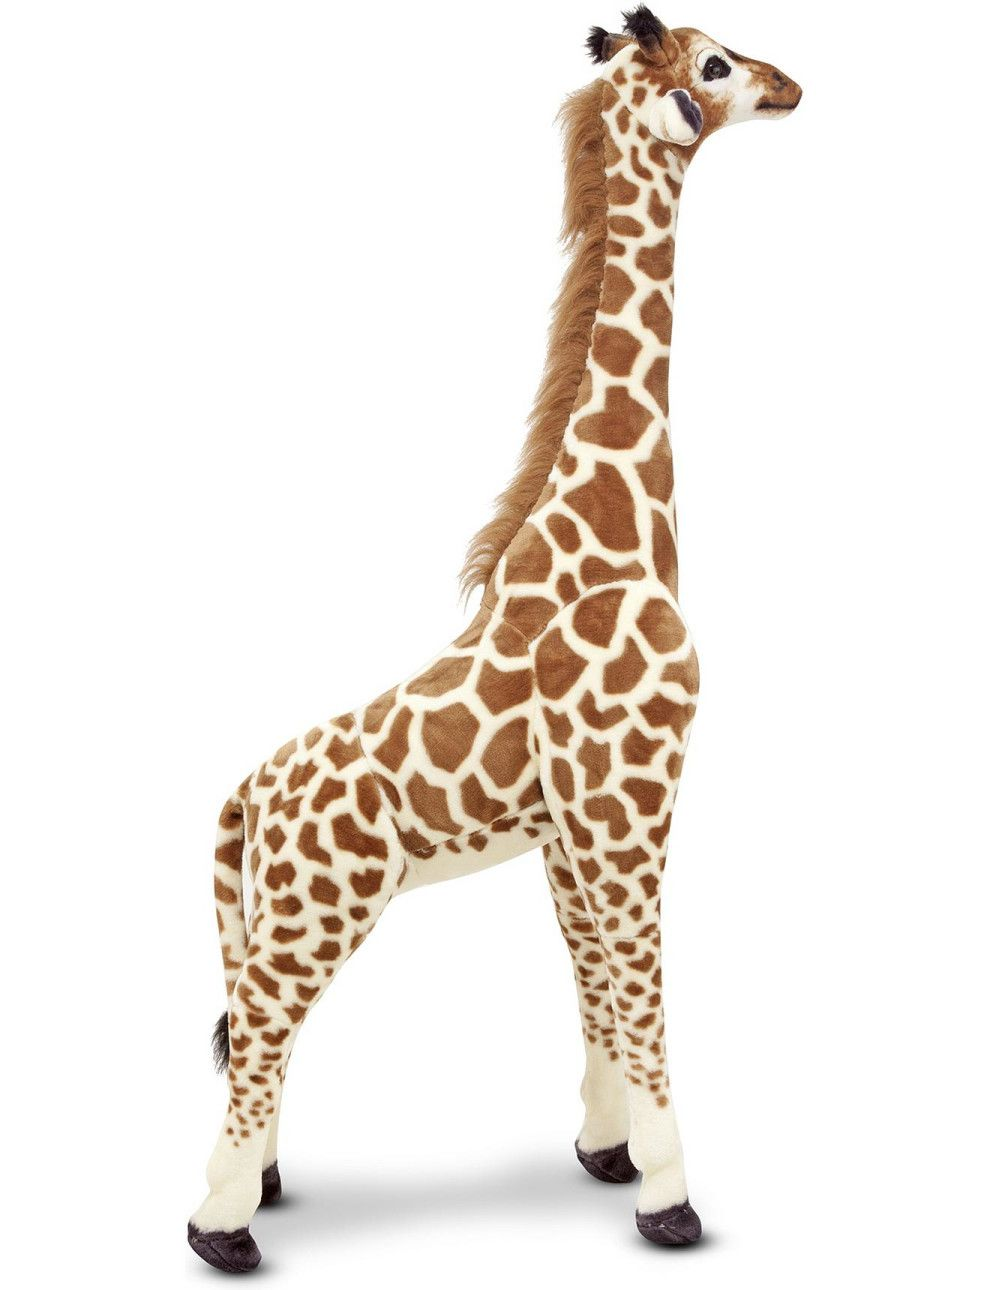 David Jones Kitchen Appliances Giant Plush Giraffe David Jones For The Home Pinterest